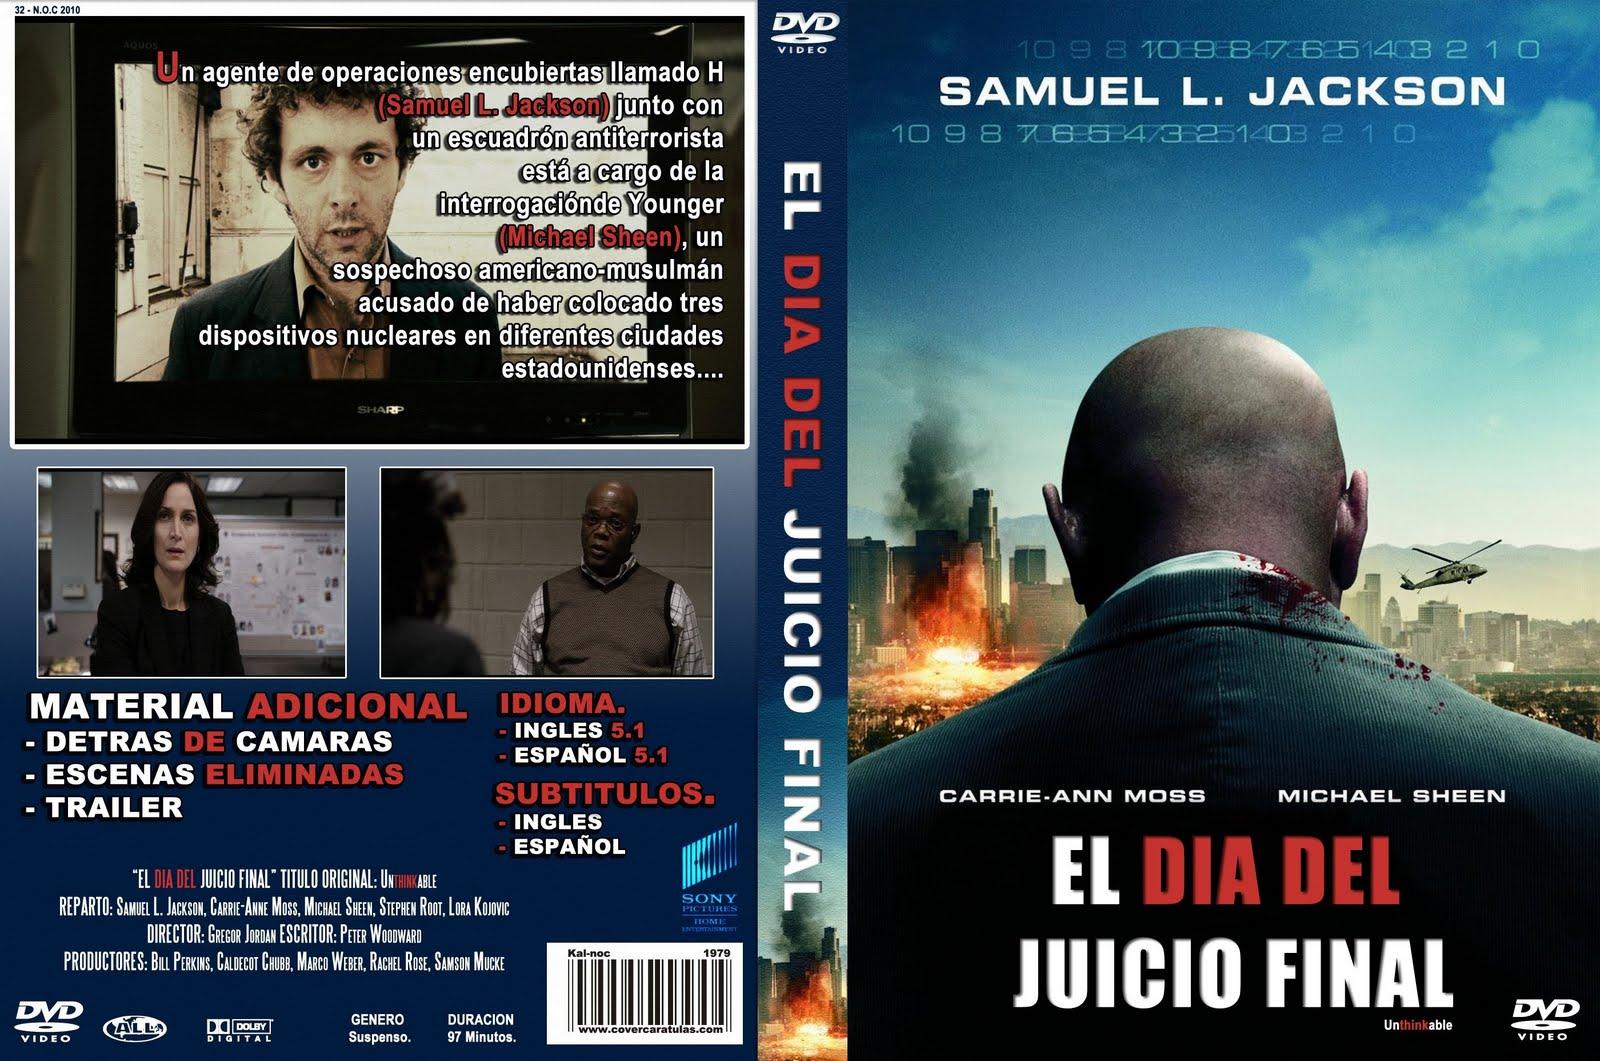 http://1.bp.blogspot.com/-yPz9RcA9Cl8/TcsIyk_1AVI/AAAAAAAAAkk/N88OQNybO98/s1600/El_Dia_Del_Juicio_Final_-_Custom_por_kal-noc_%255Bdvd%255D_80.jpg